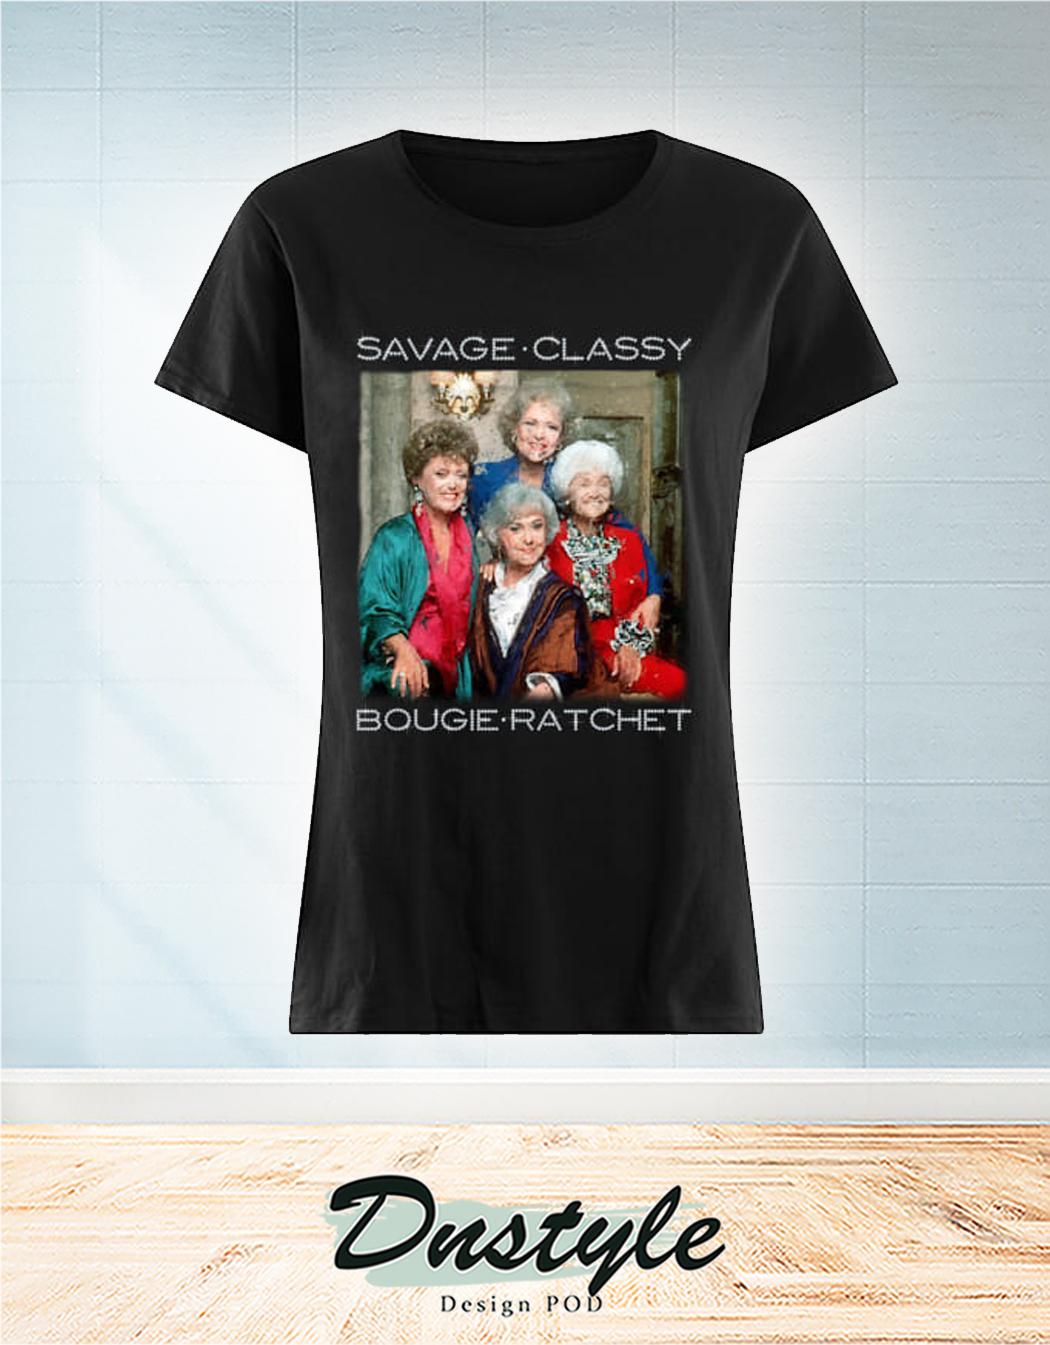 The Golden Girls Savage Classy Bougie Ratchet Women T-Shirt